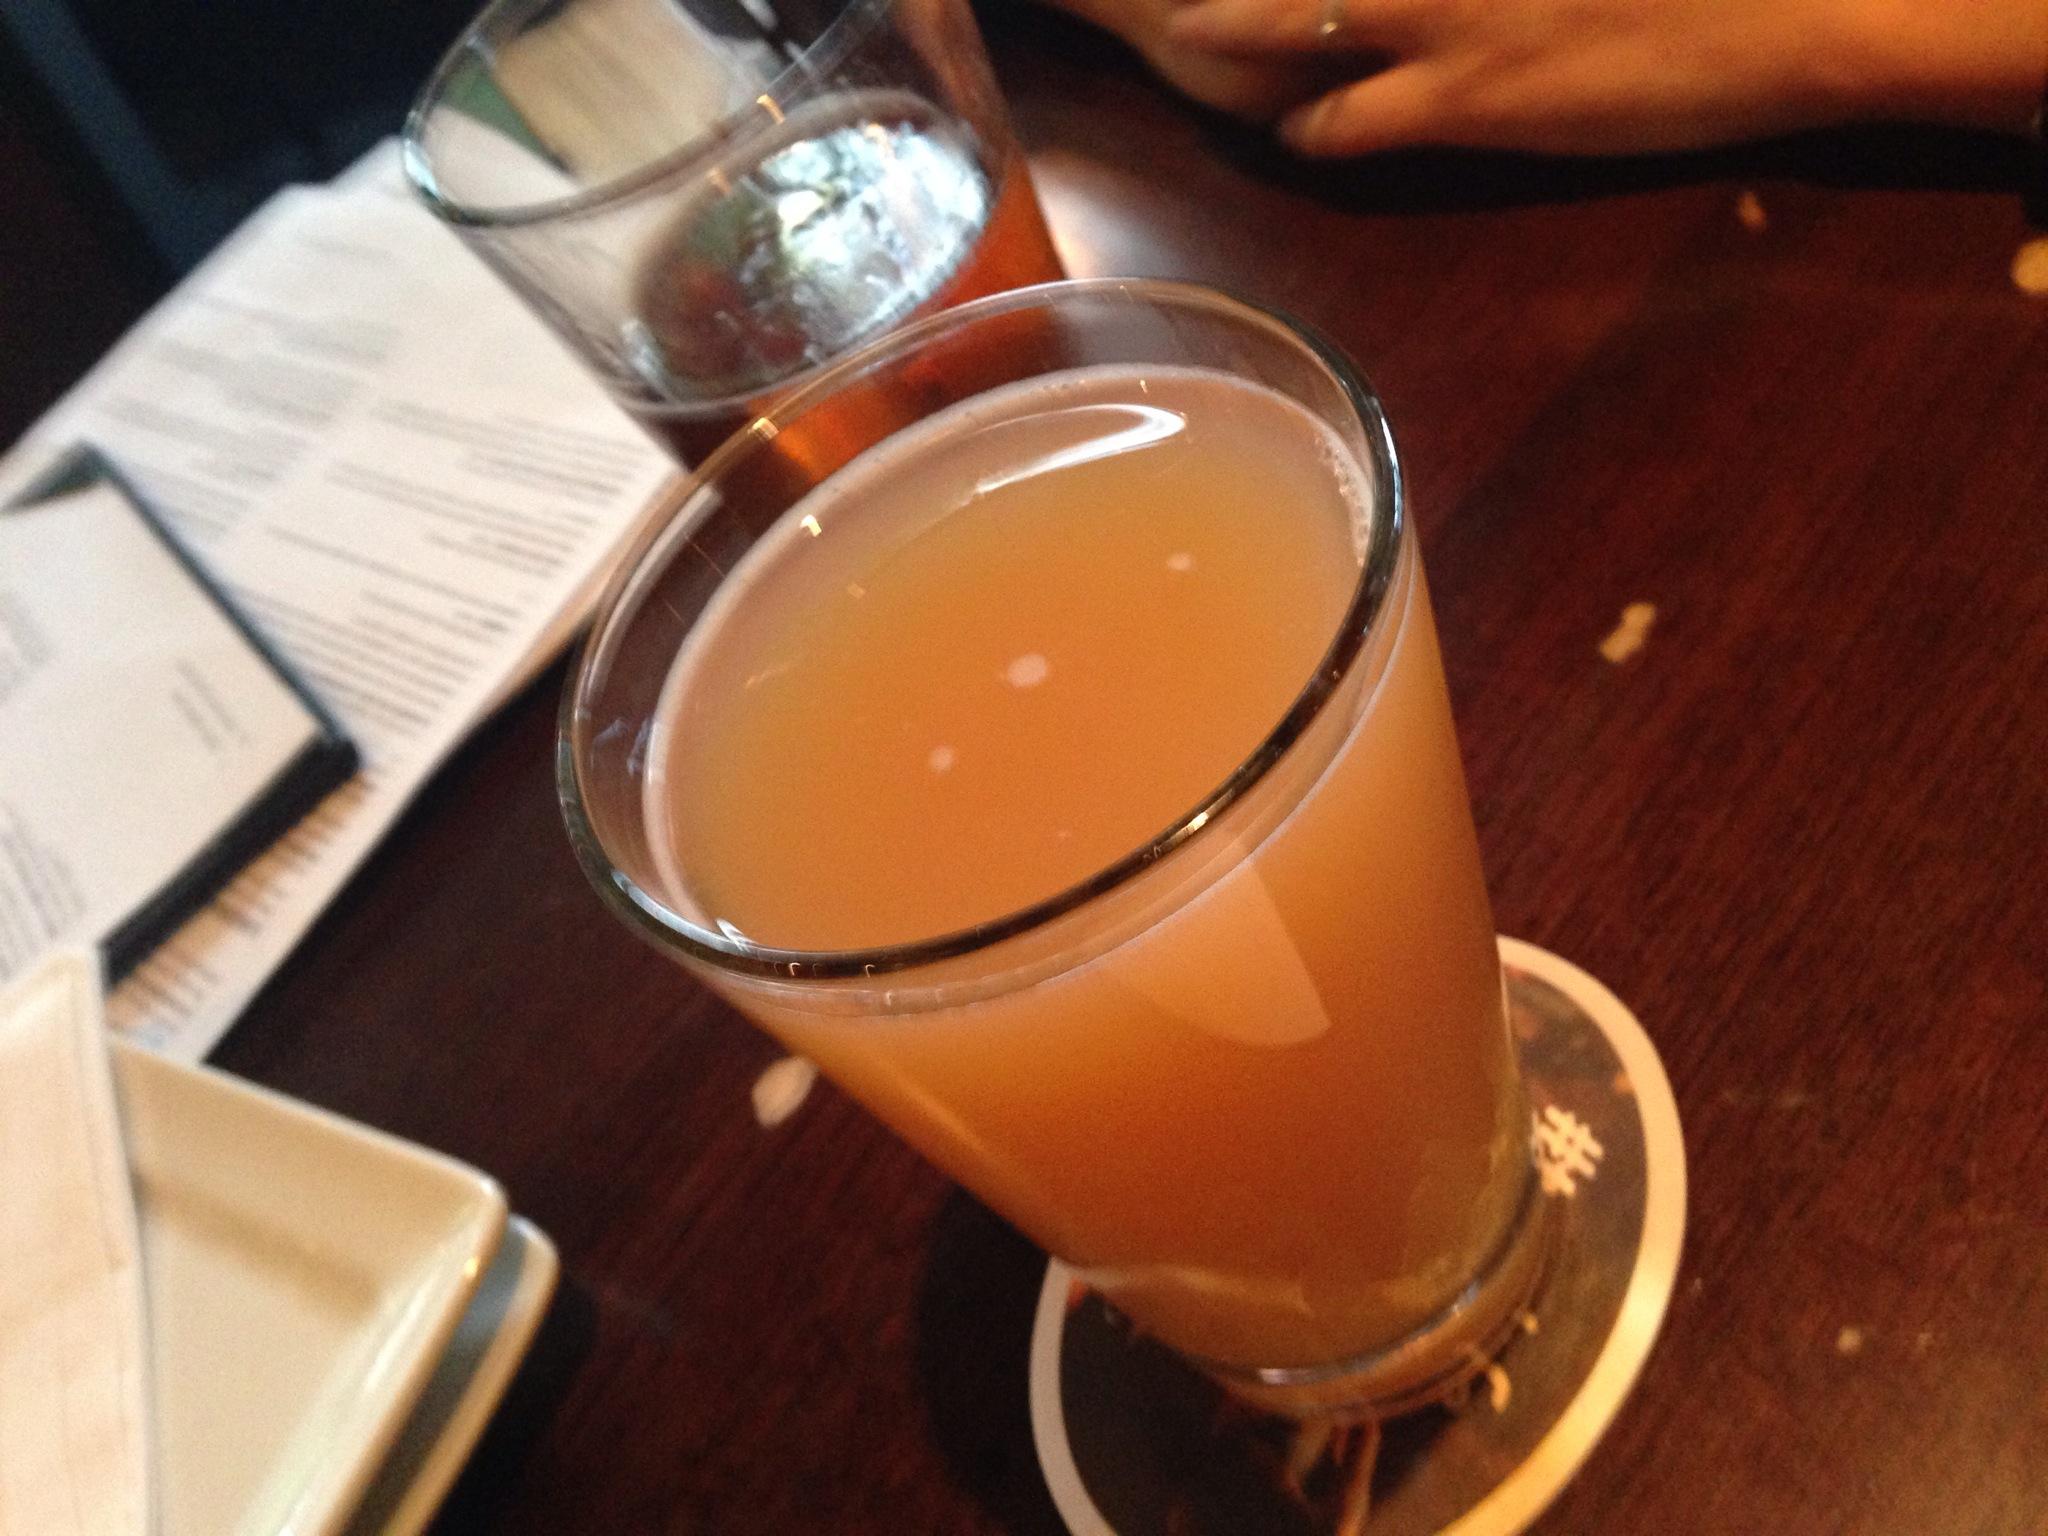 Parallel 49 Grapefruit Radler & Pumpkin Ale @ St Augustine